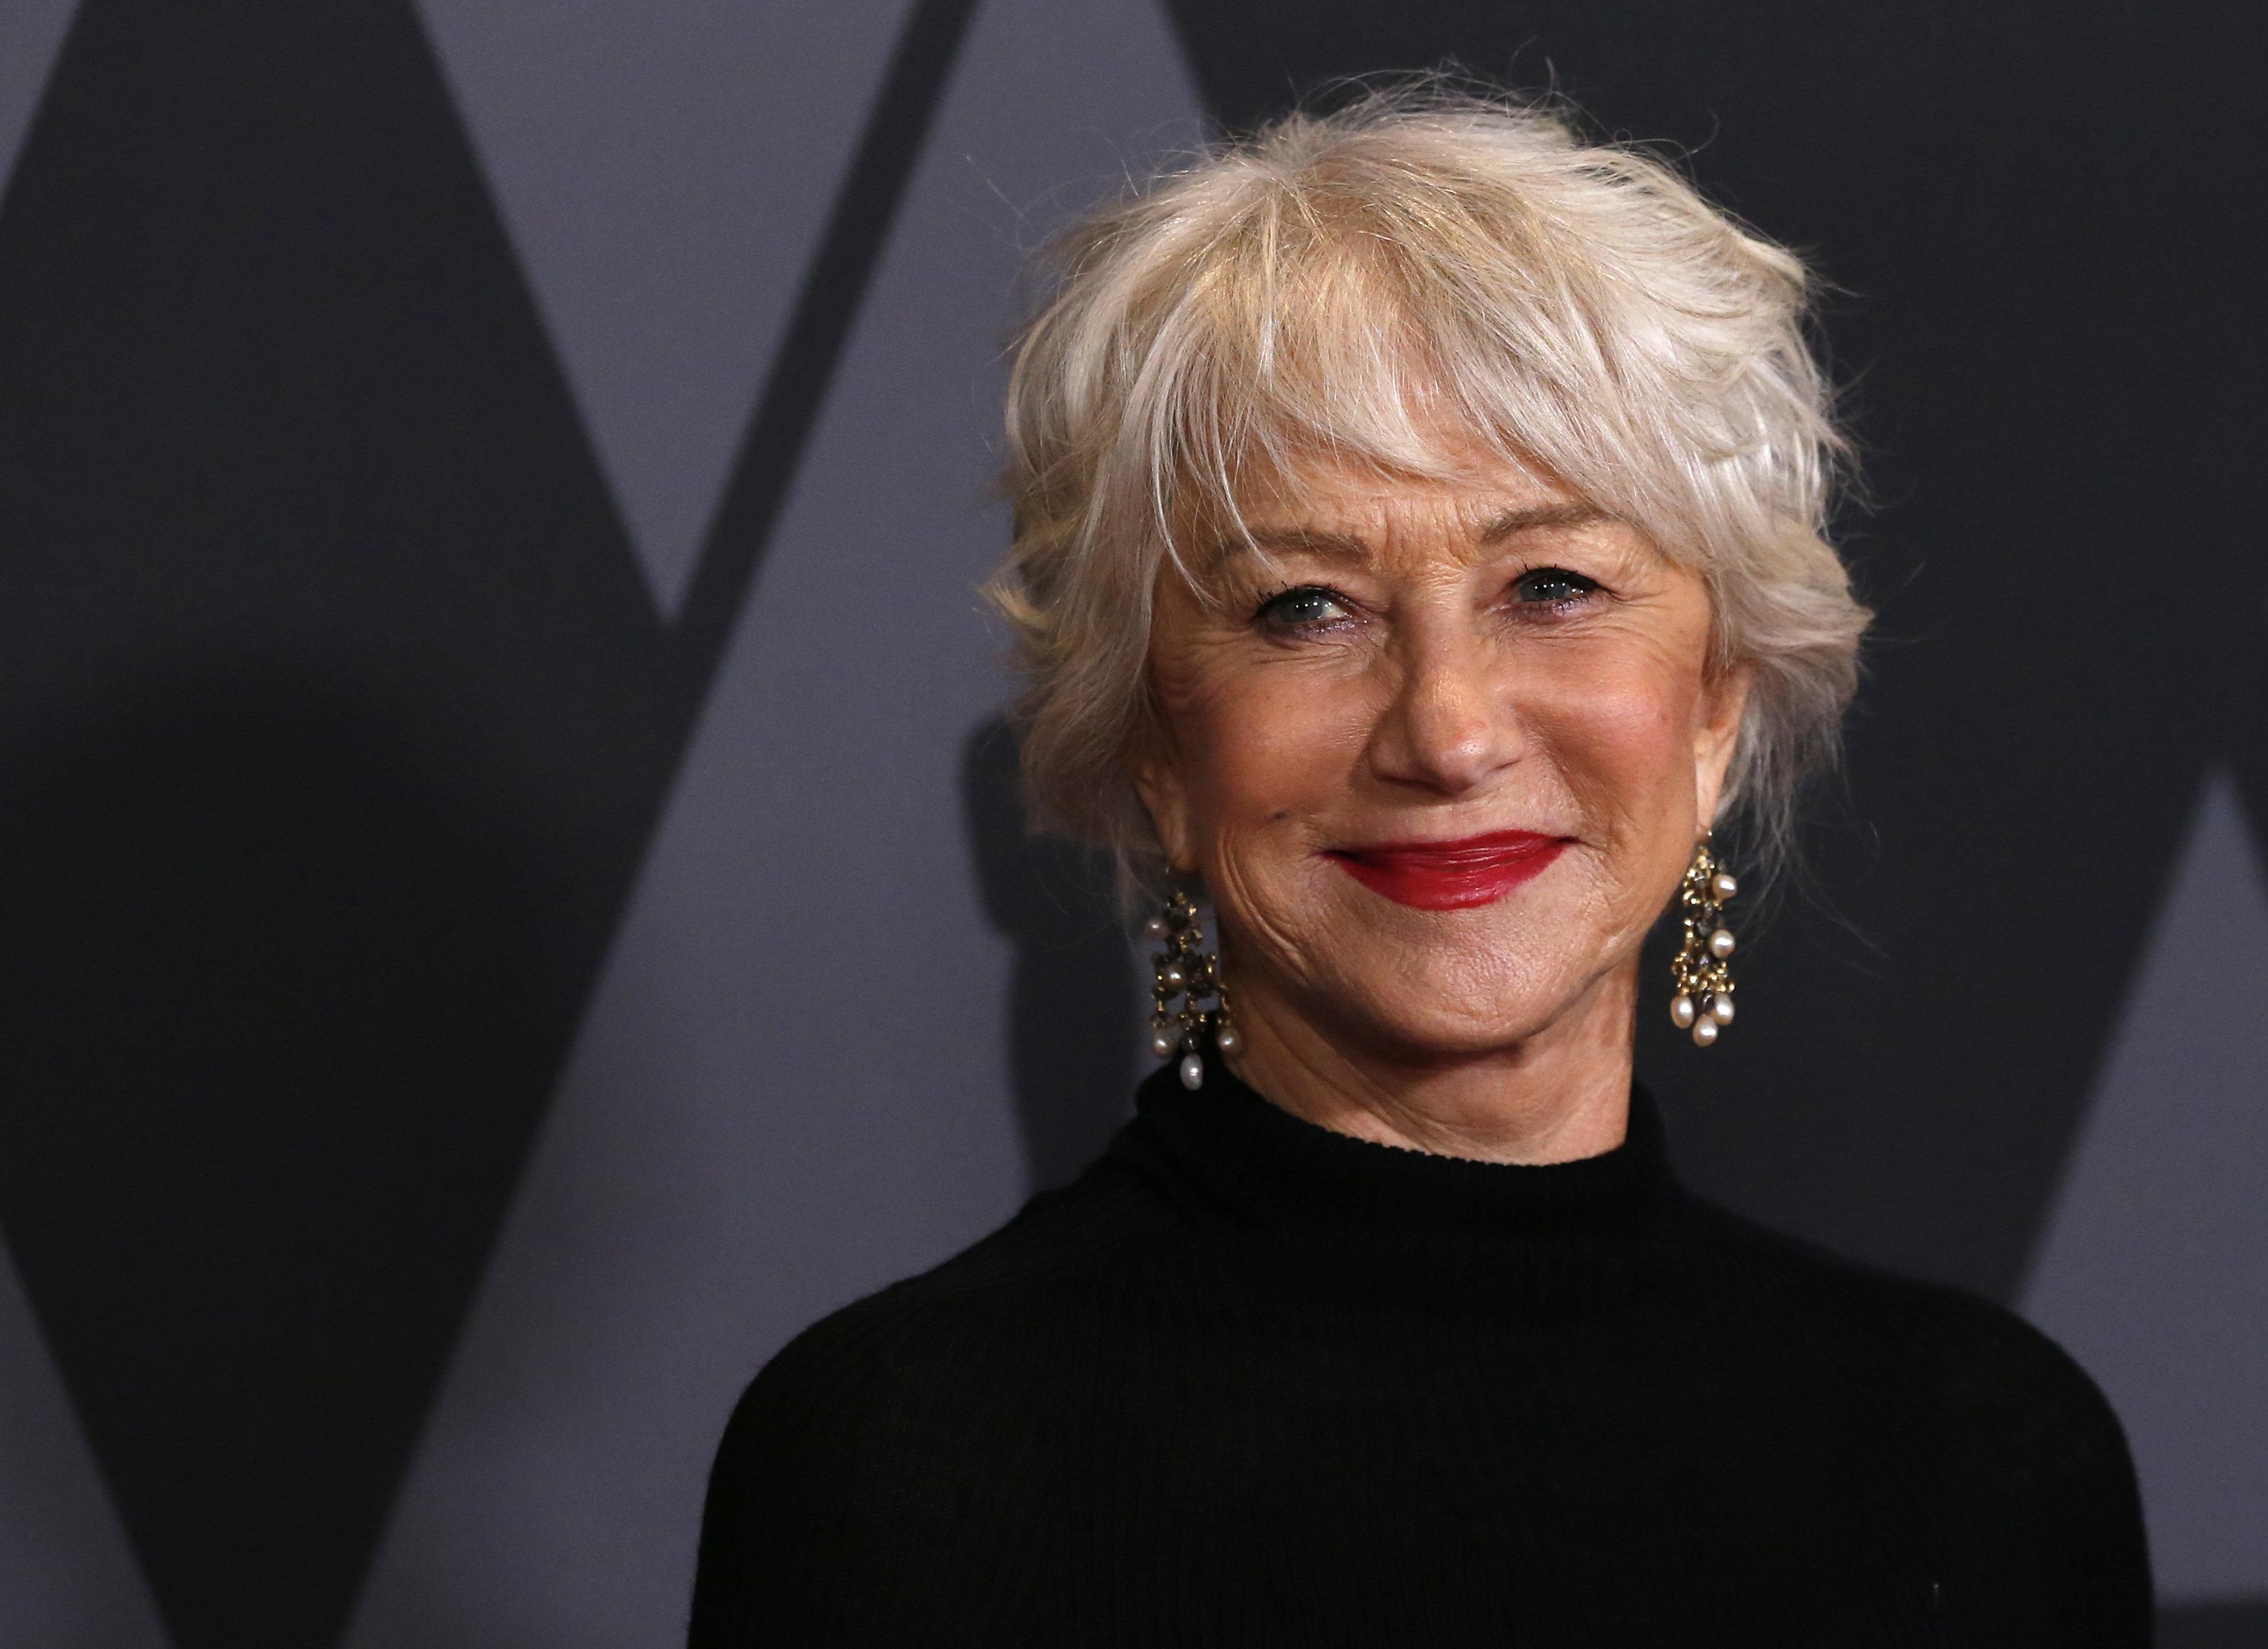 Helen Mirren: Αποκαλύπτει ότι οι άντρες εκτίθονταν μπροστά της κάθε εβδομάδα όταν εκείνη ήταν 20